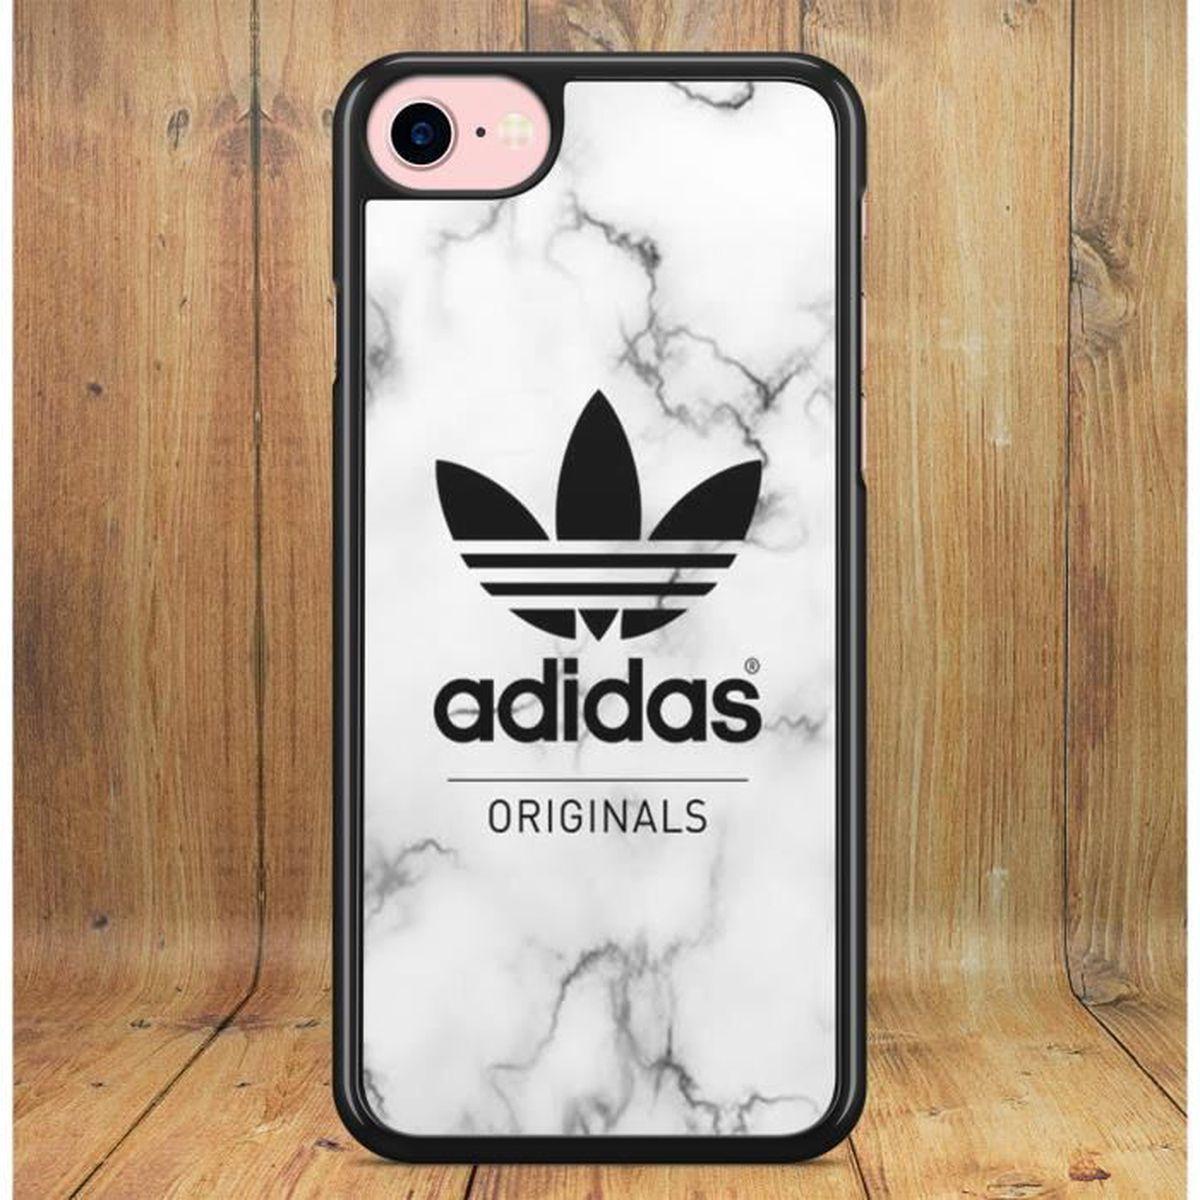 coque iphone 6 6s adidas effet marbre blanc noir l